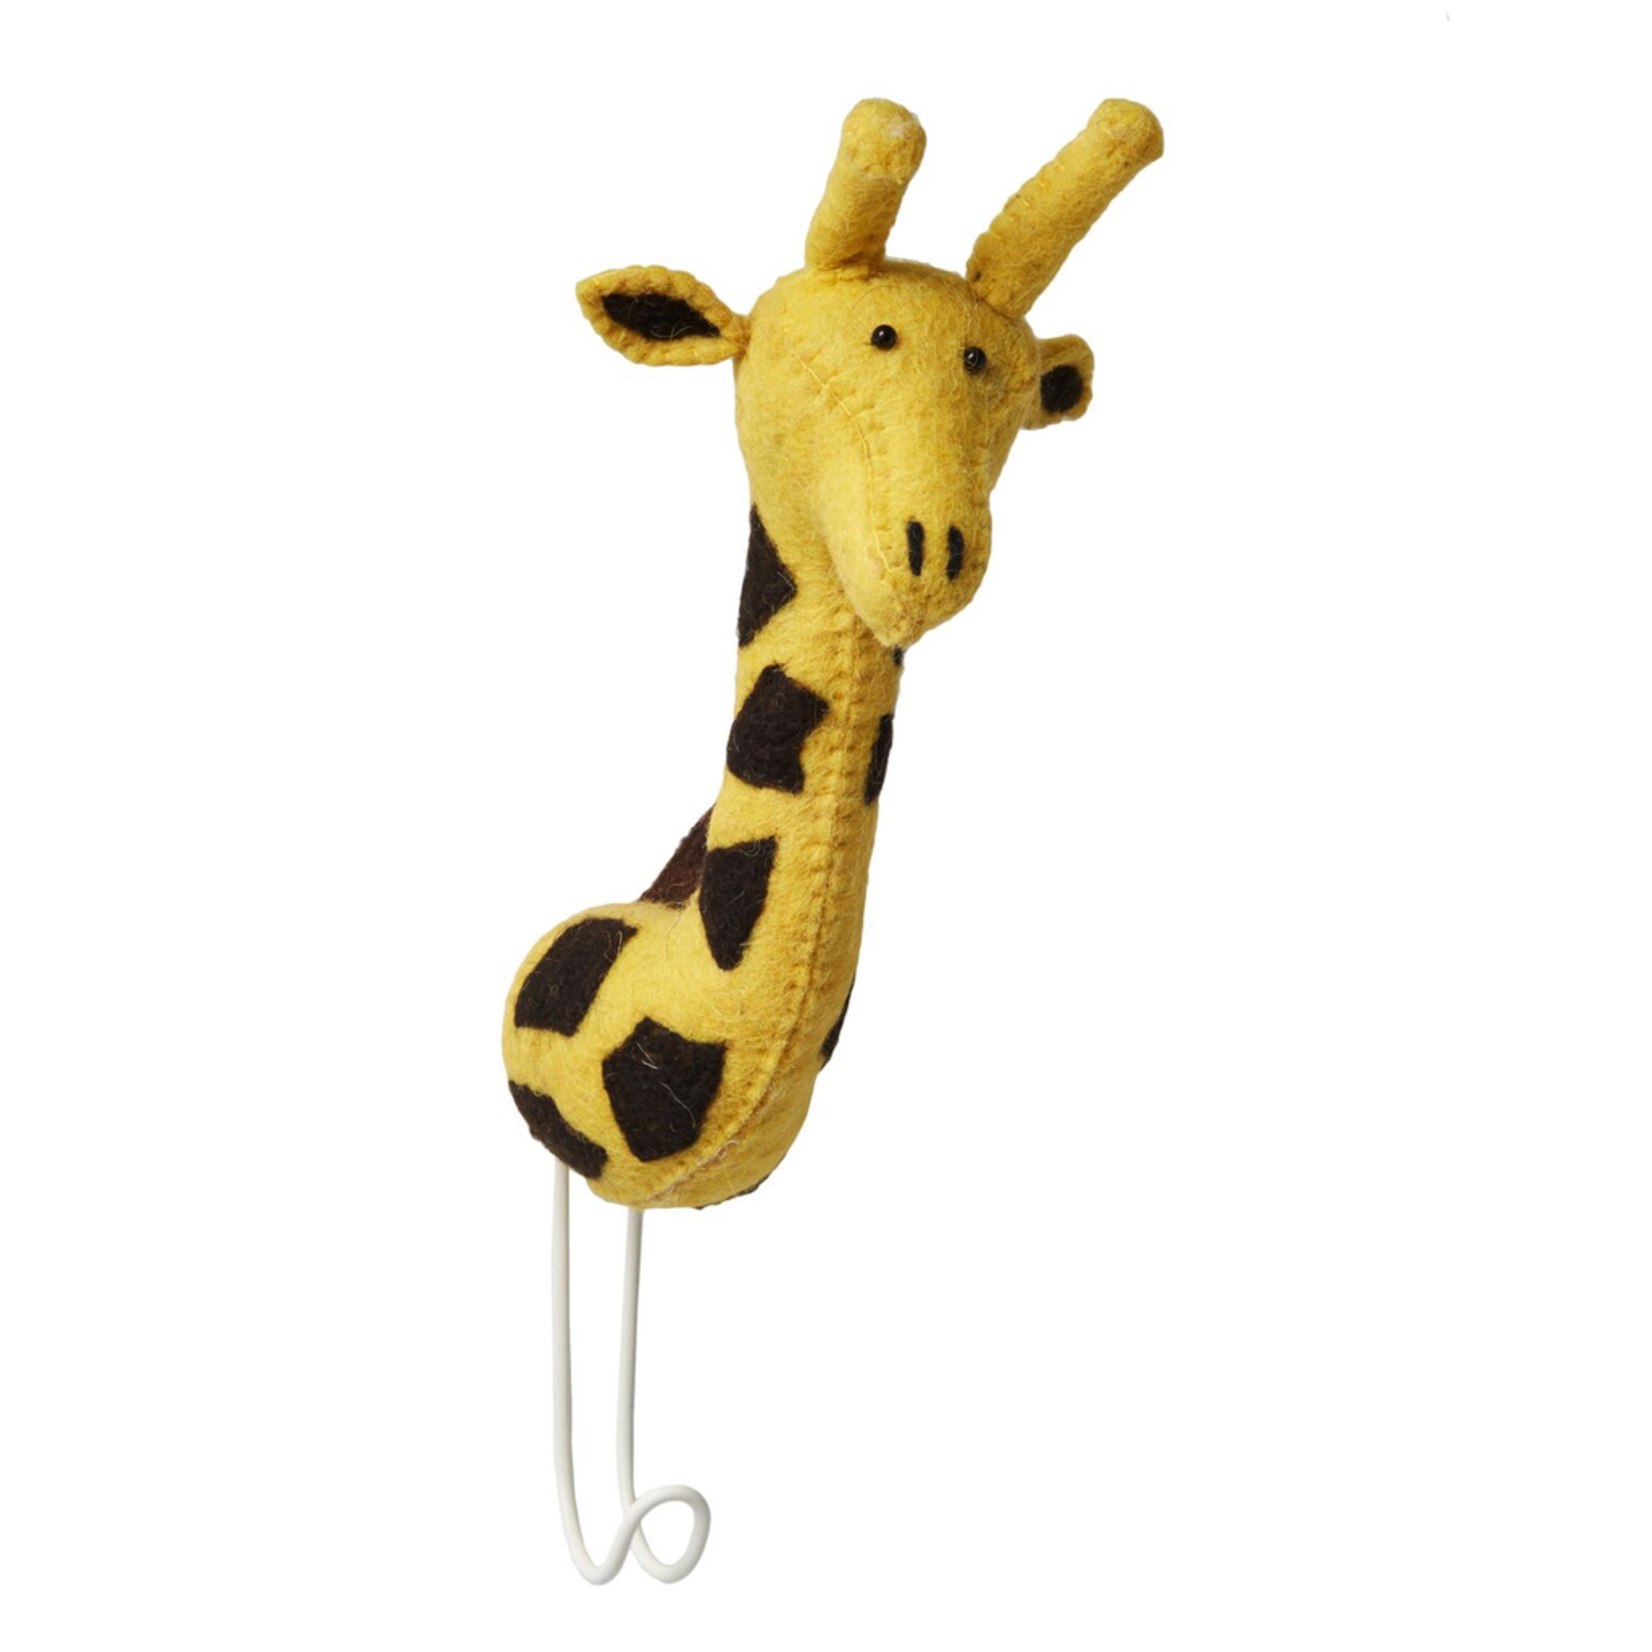 Fiona Walker Fiona Walker Felt Single Head Yellow Hook Giraffe